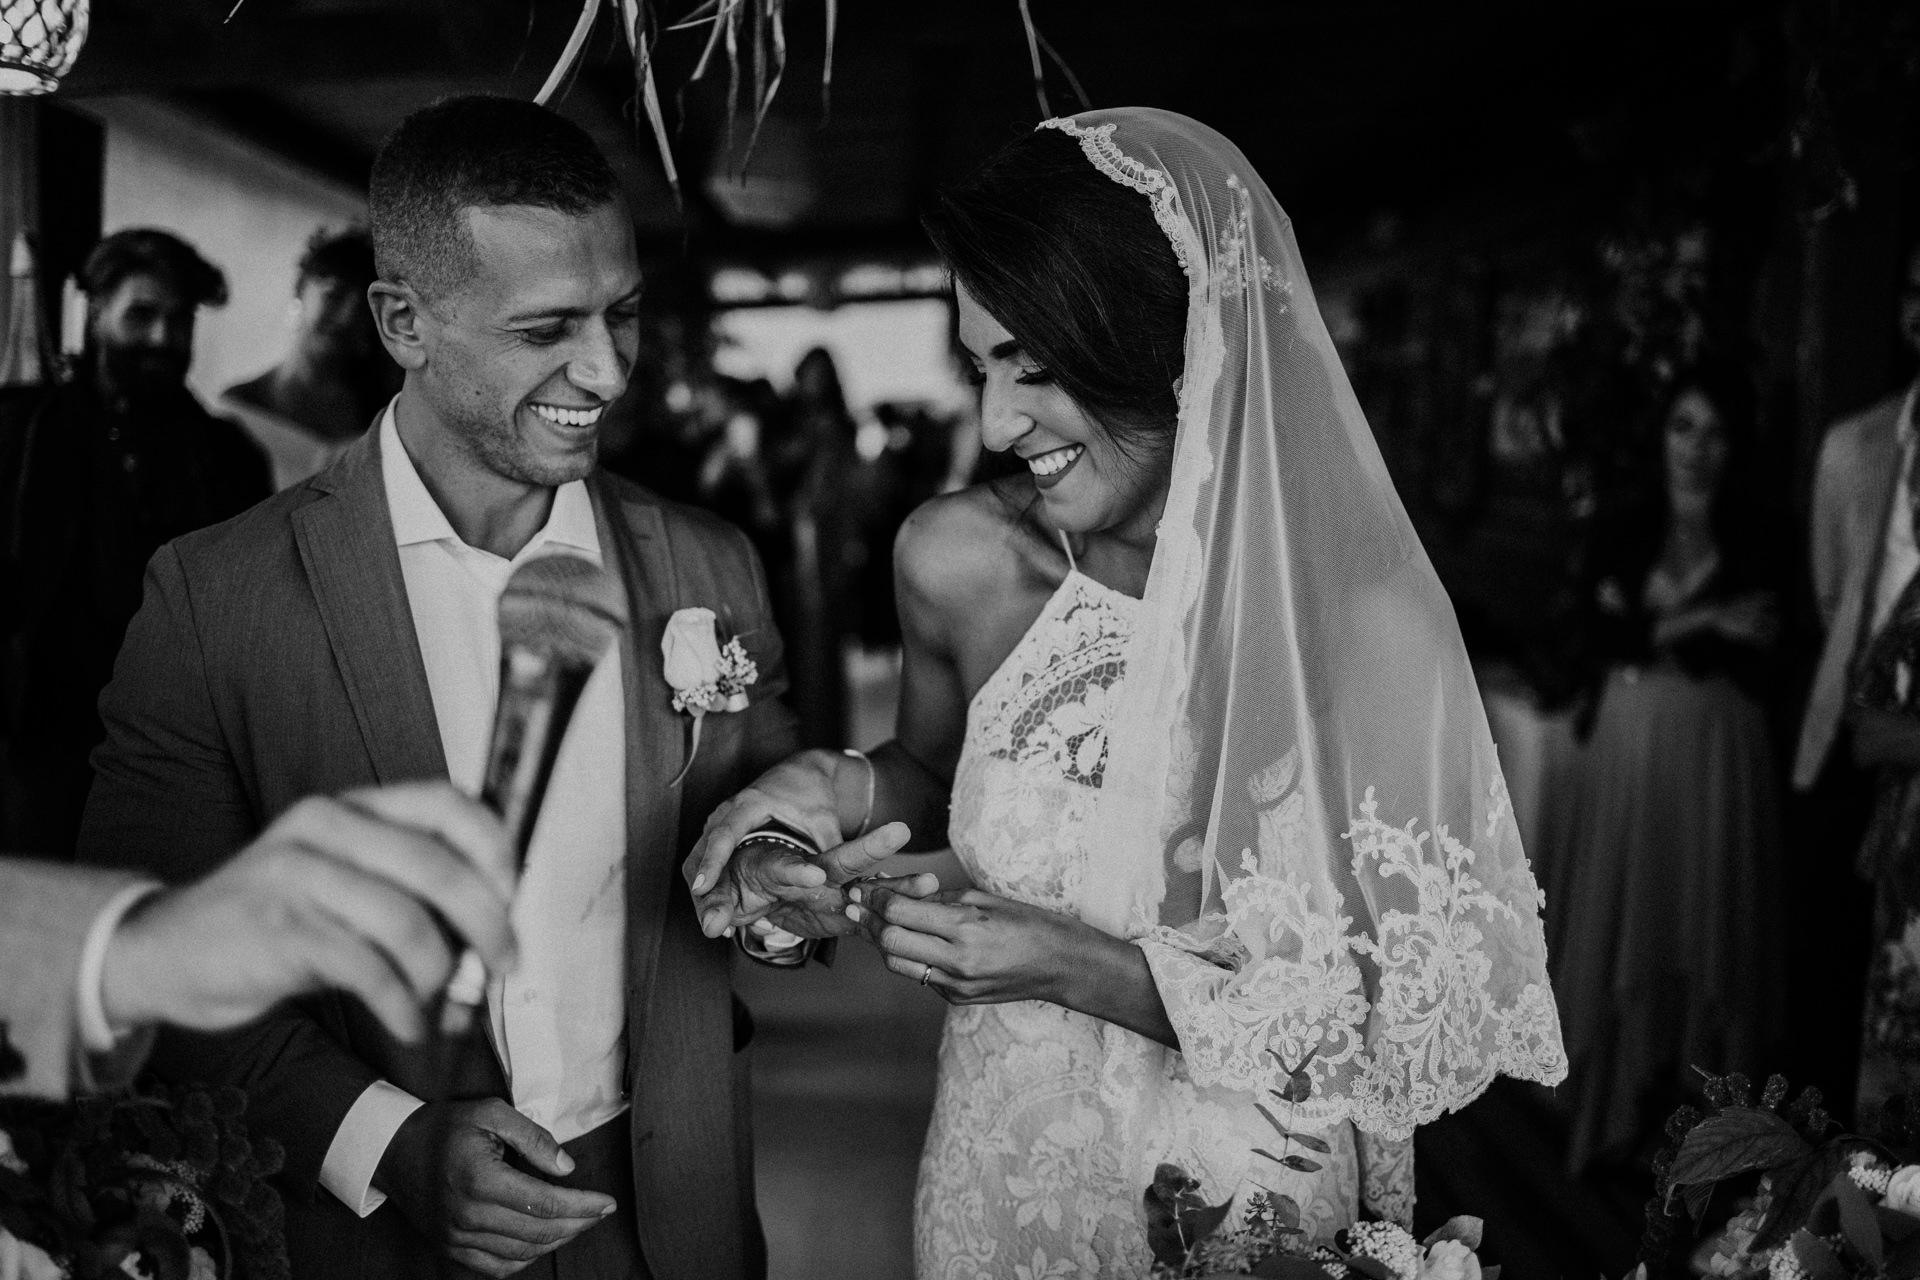 Fiumara Beach - Grosseto, Italy Wedding Photographer | The couple laughs with delight